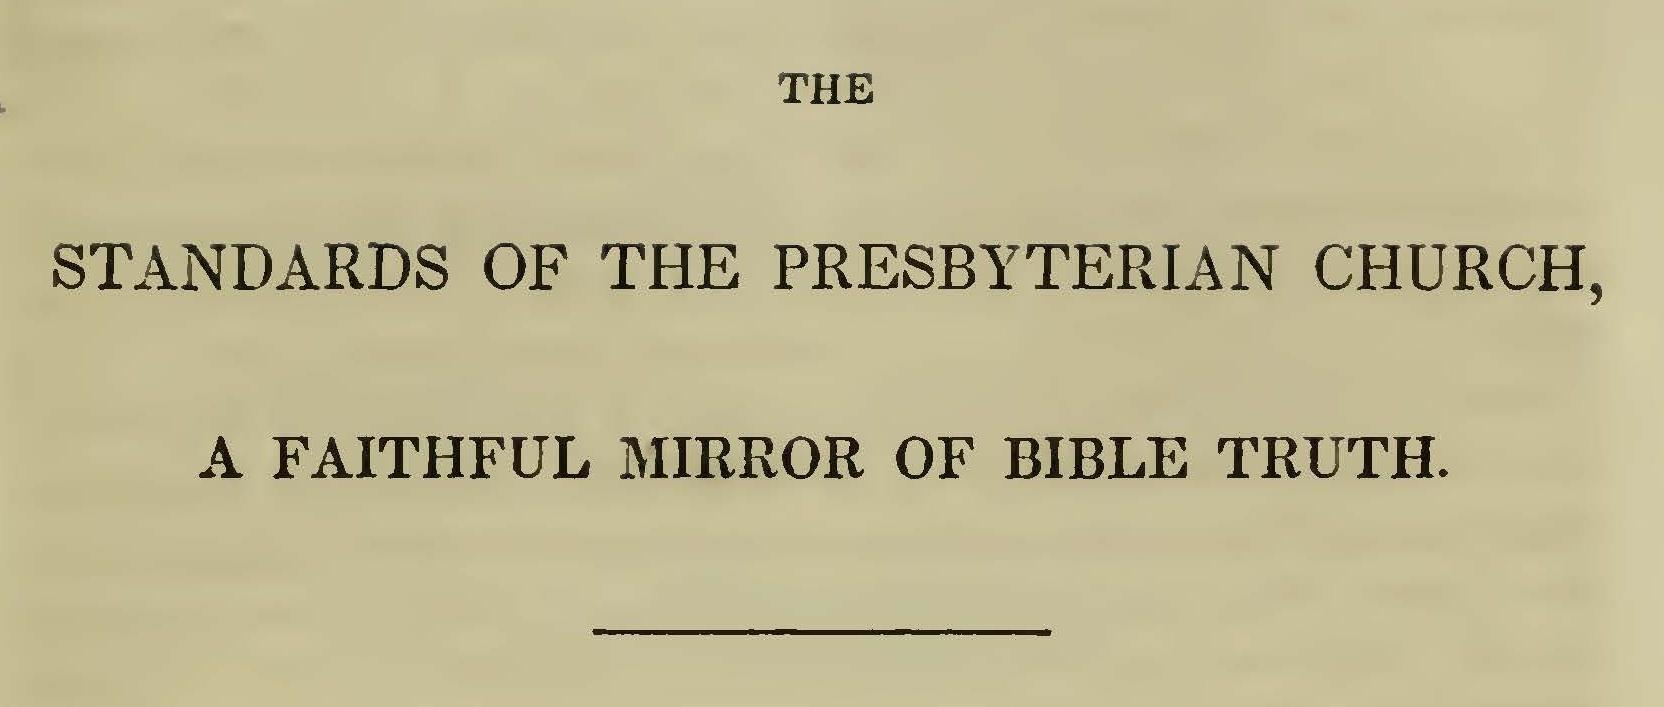 Baker, Daniel, The Standards of the Presbyterian Church Title Page.jpg